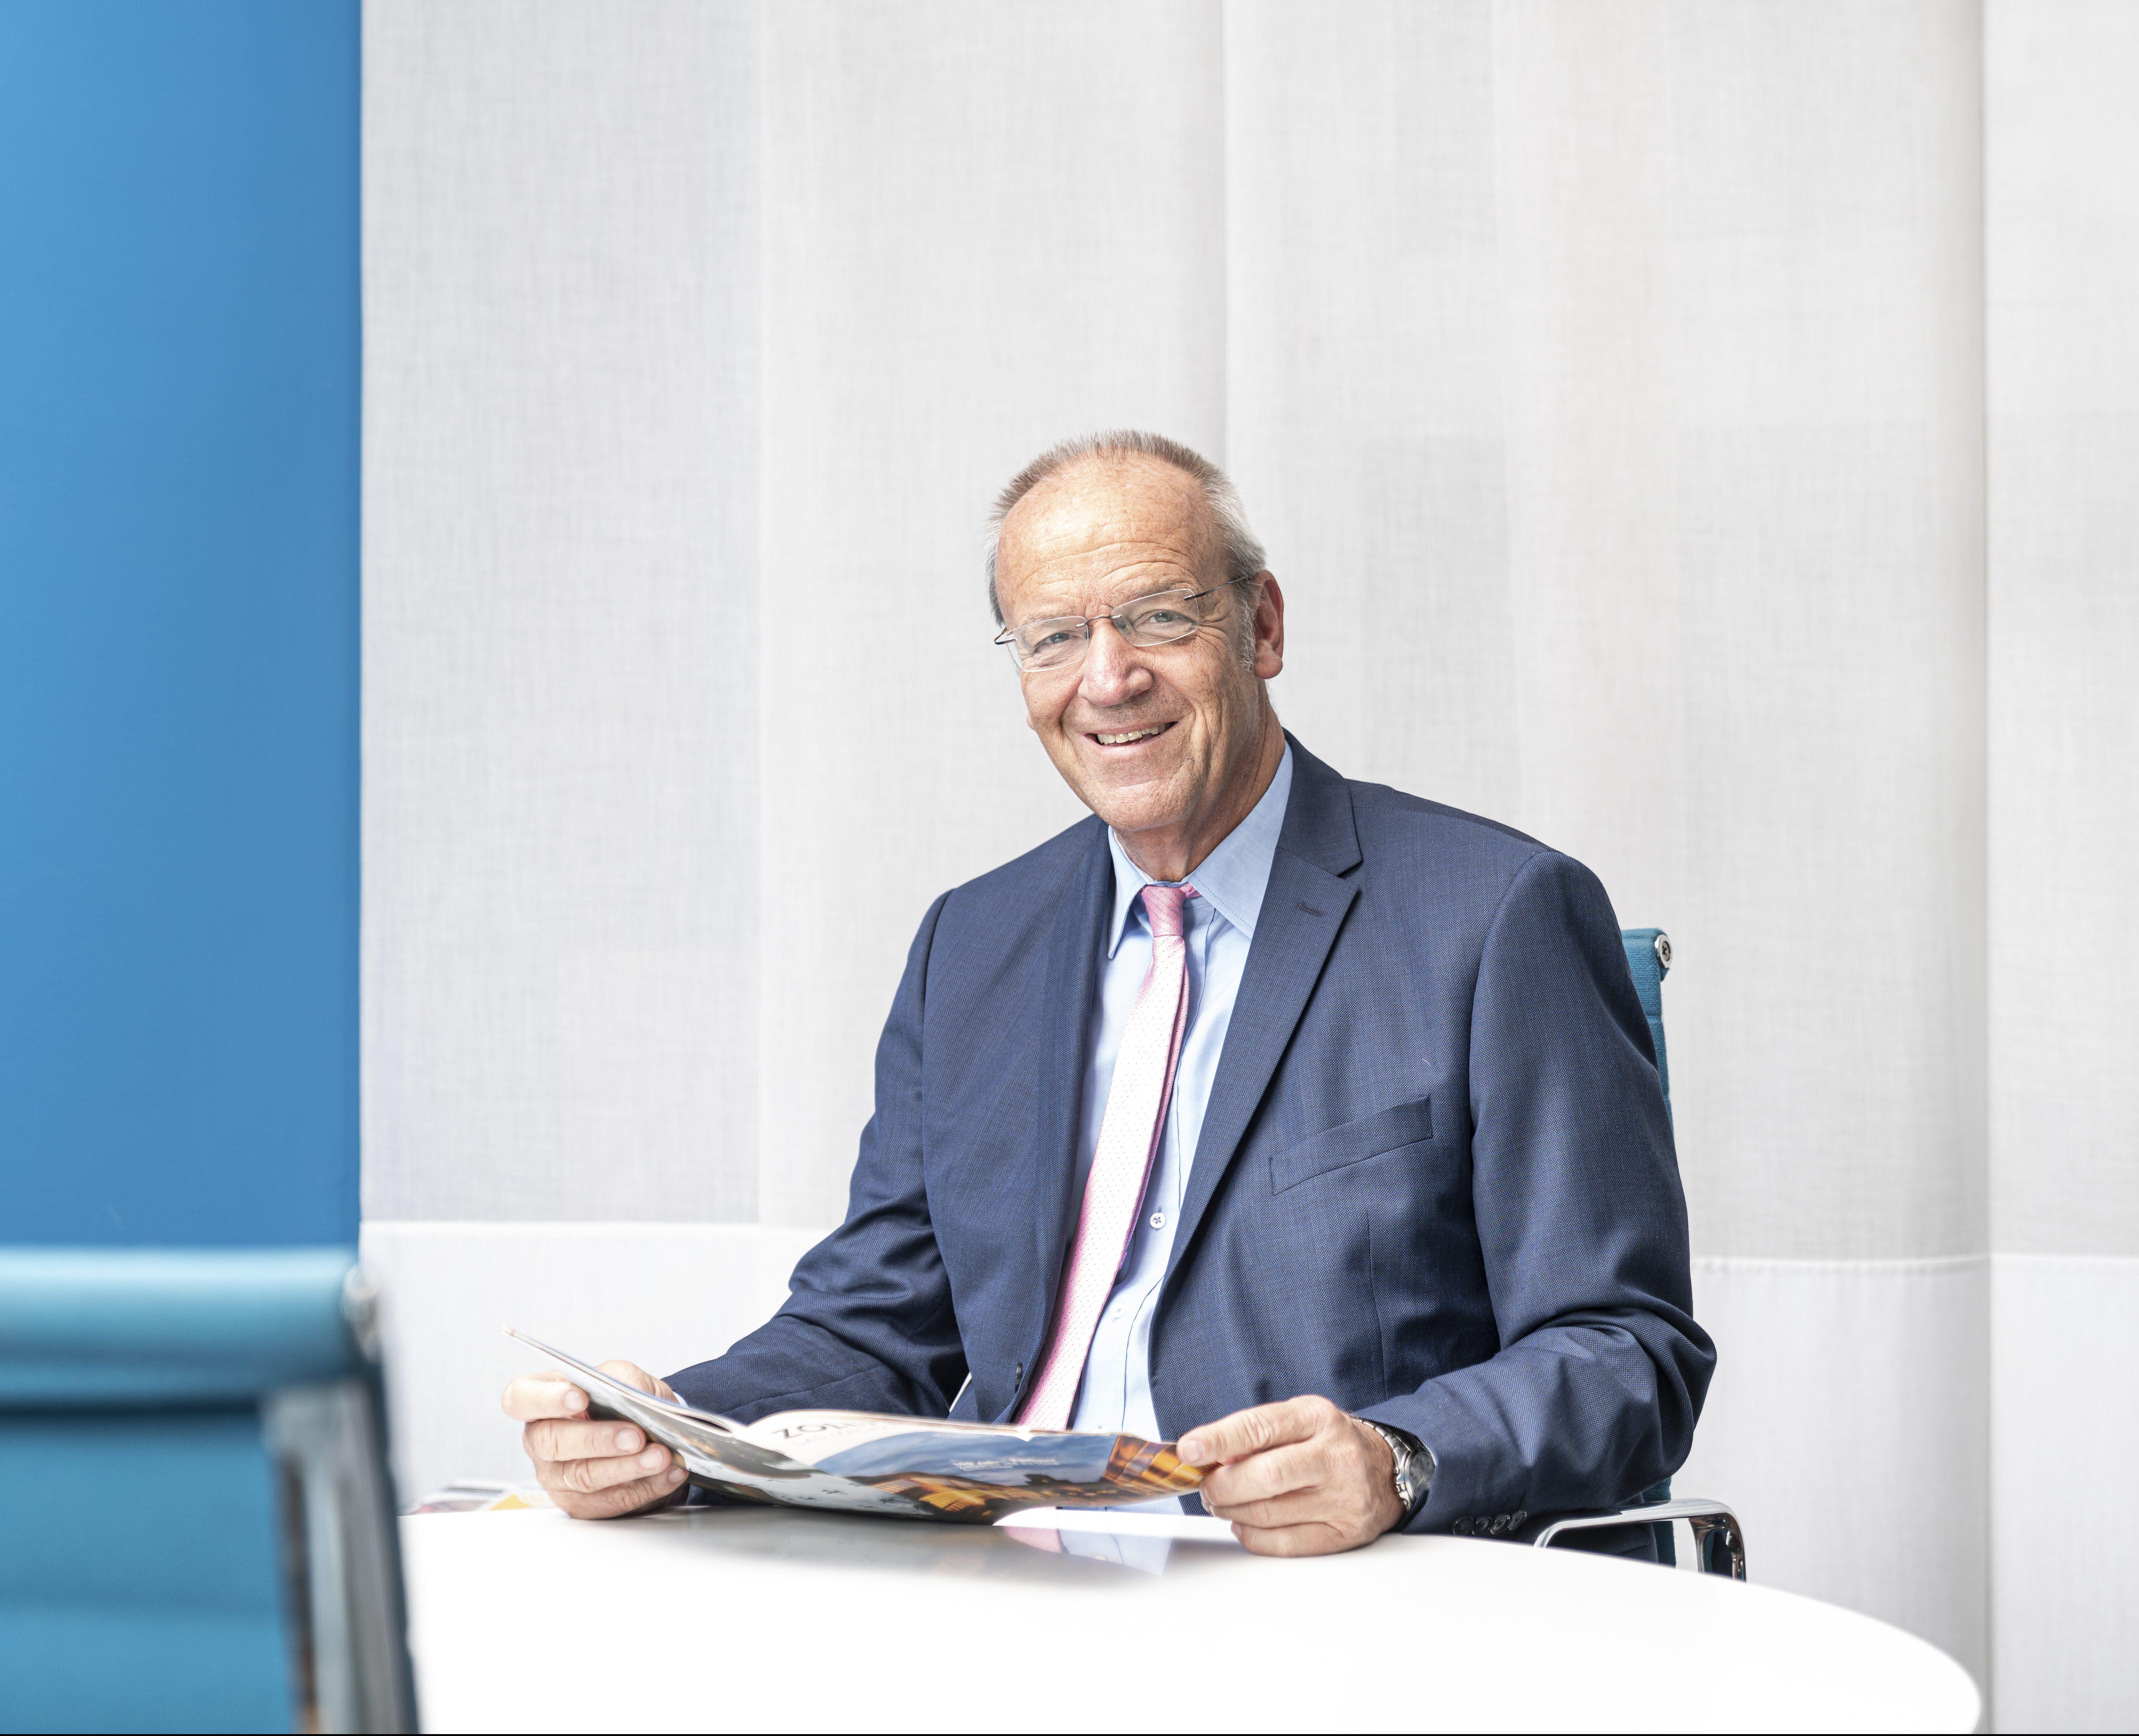 Dieter Kerstings Geschäftsführer der C.C. Gruppe